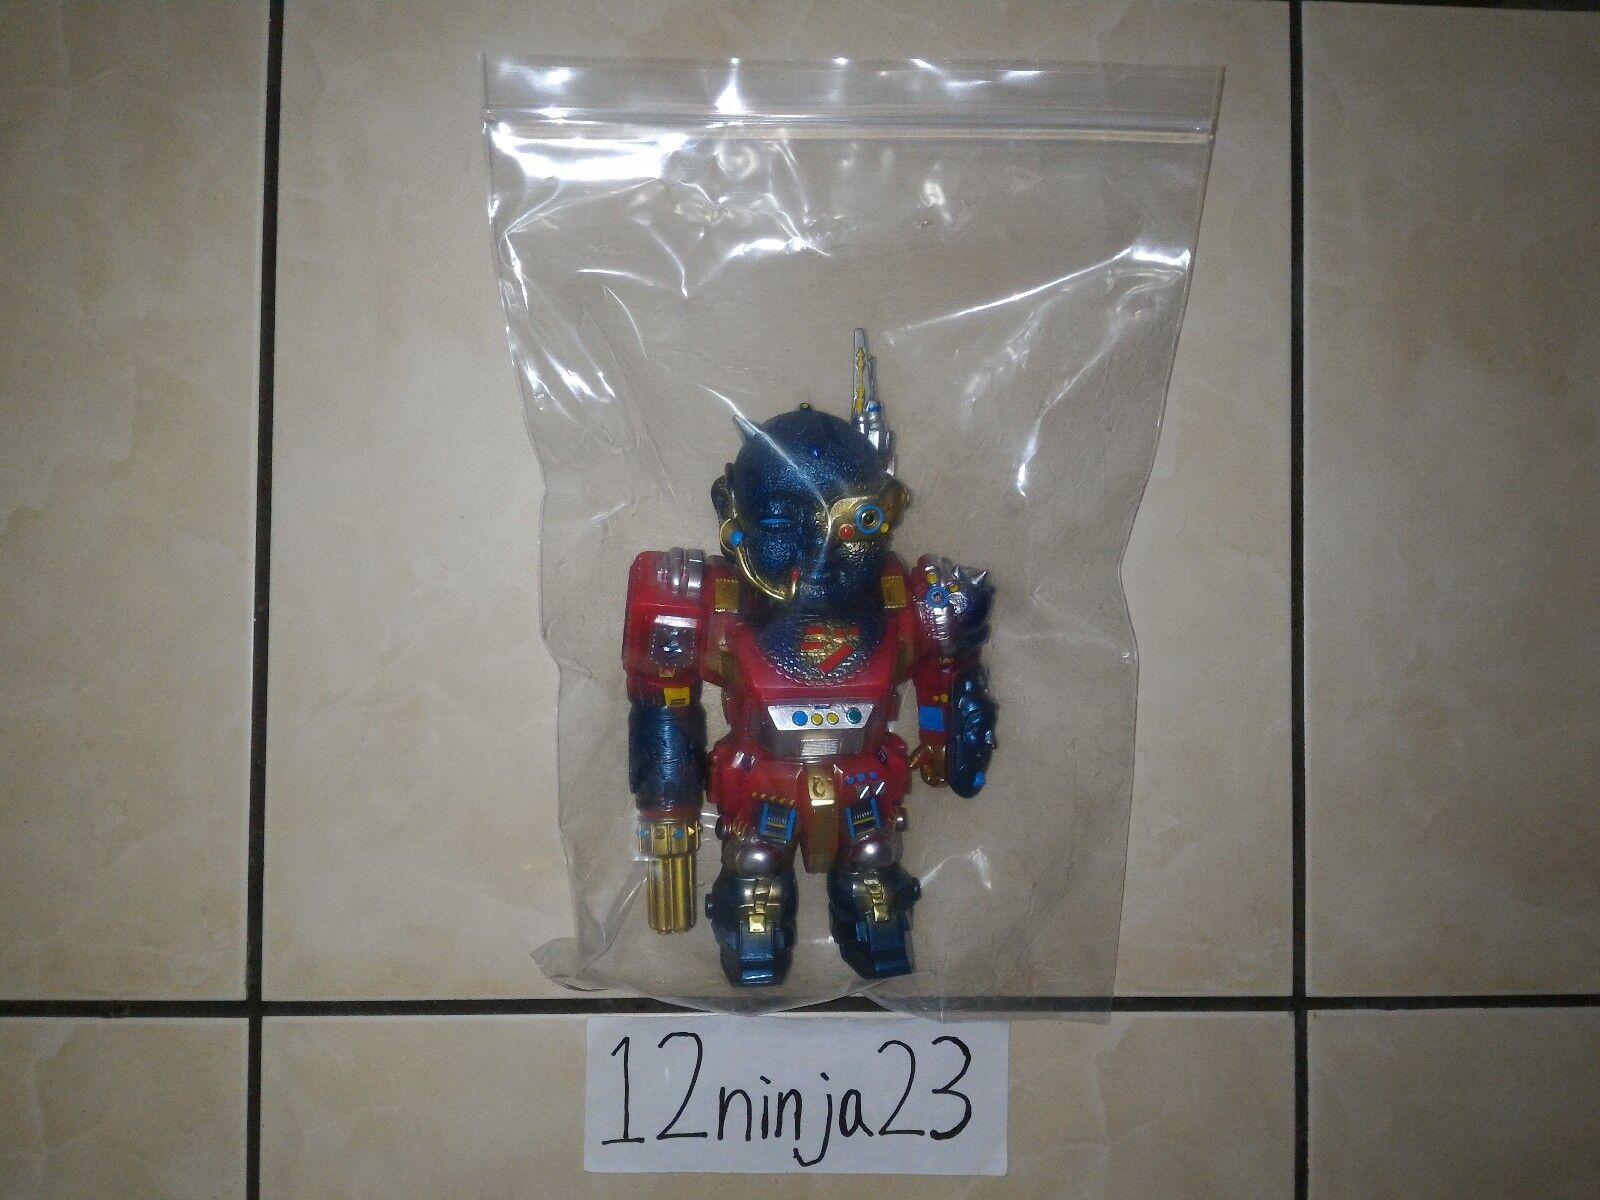 Mirock Toy JIZO-Shoulder Red Chogokin Toys color - Sofubi Sofvi Soft Vinyl Toy